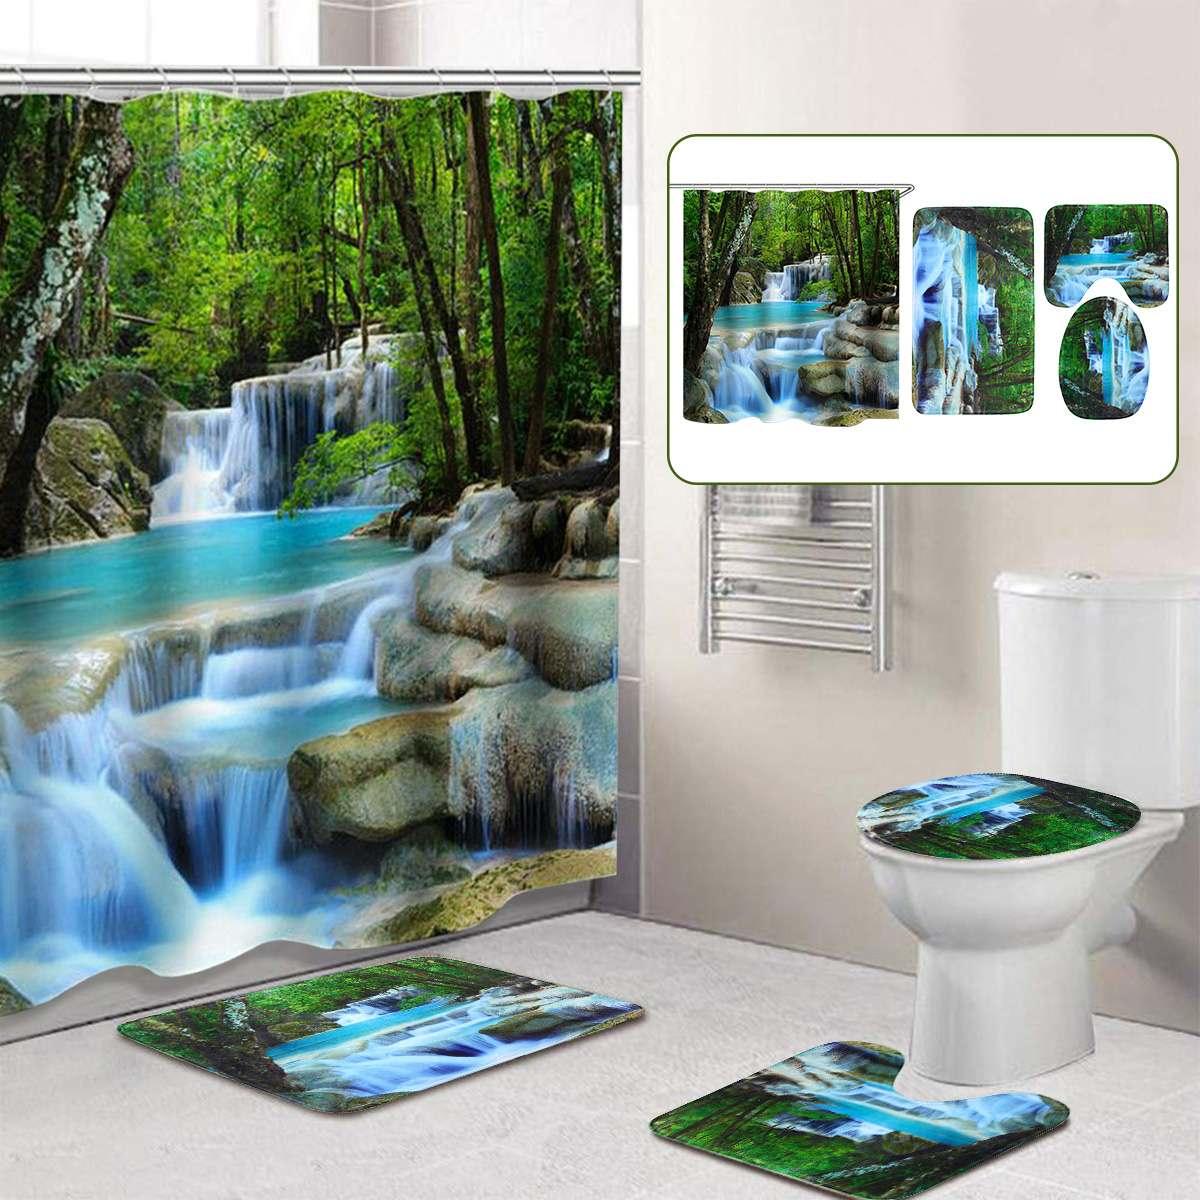 3D Wasserfall Landschaft Wasserdichte Dusche Vorhang Bad Landschaft Bäume Blume Bad Matte Set Sockel Teppich Deckel Wc Abdeckung